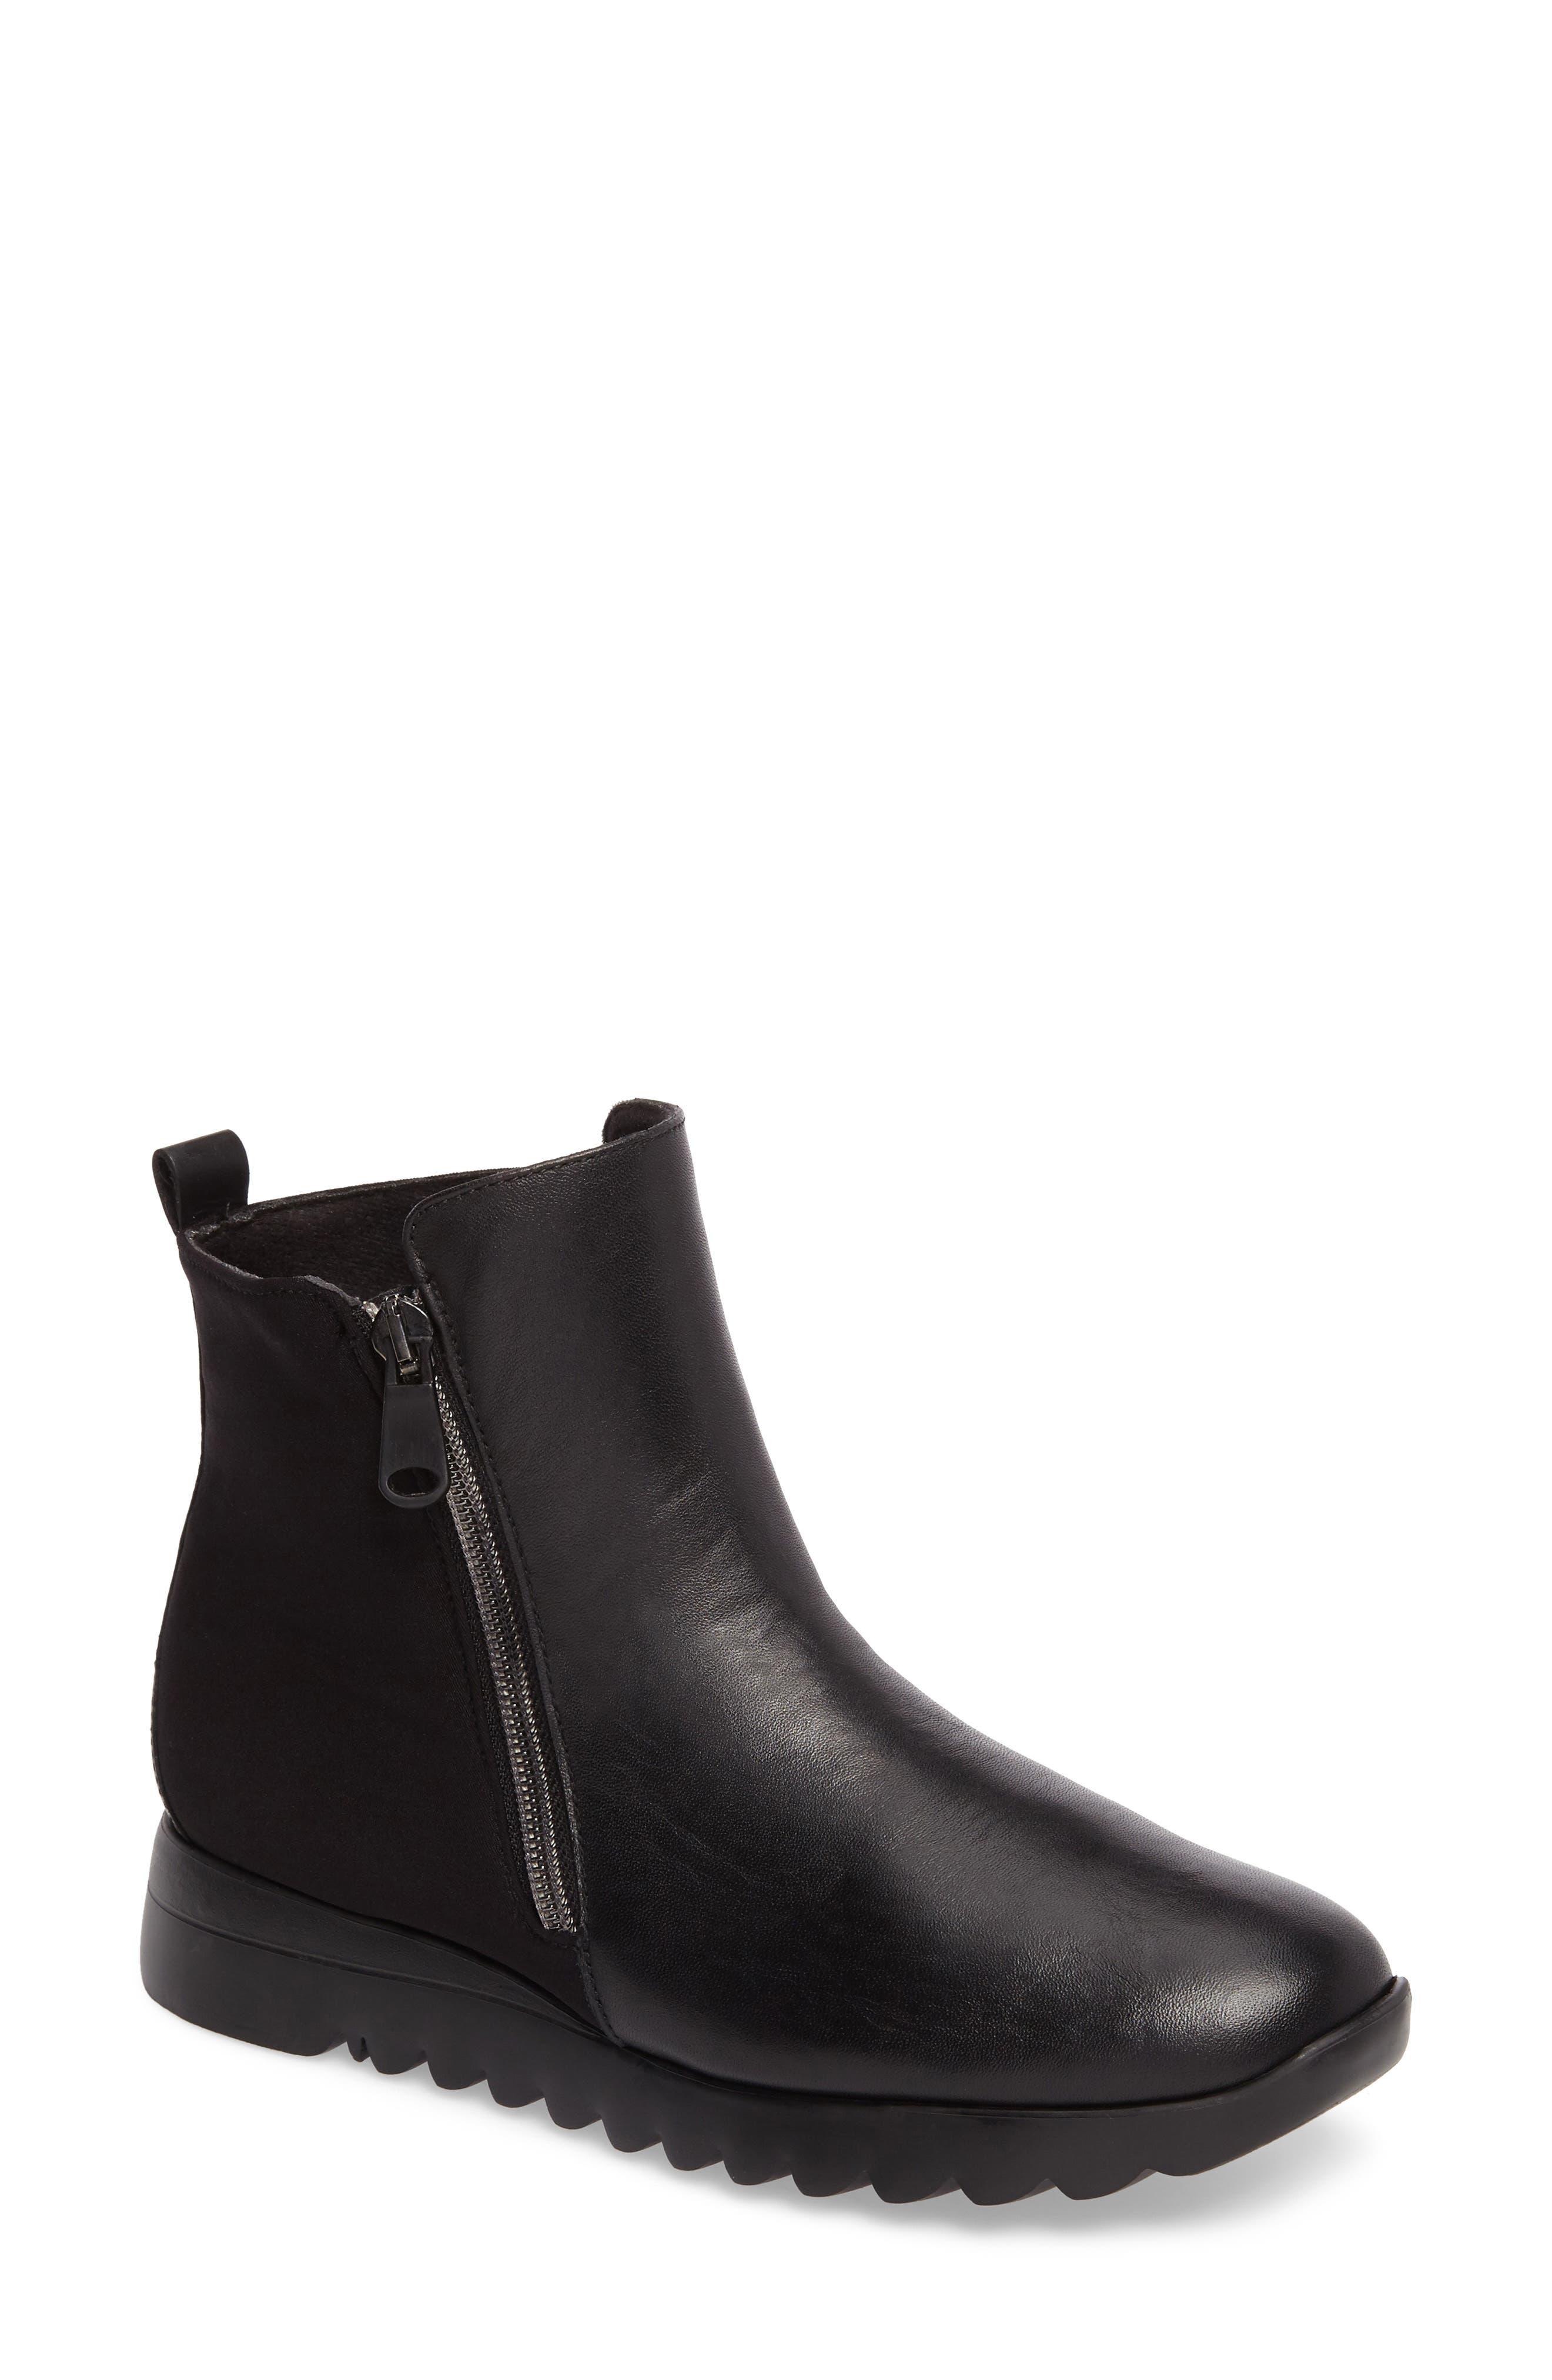 Ashcroft Bootie,                         Main,                         color, Black Leather